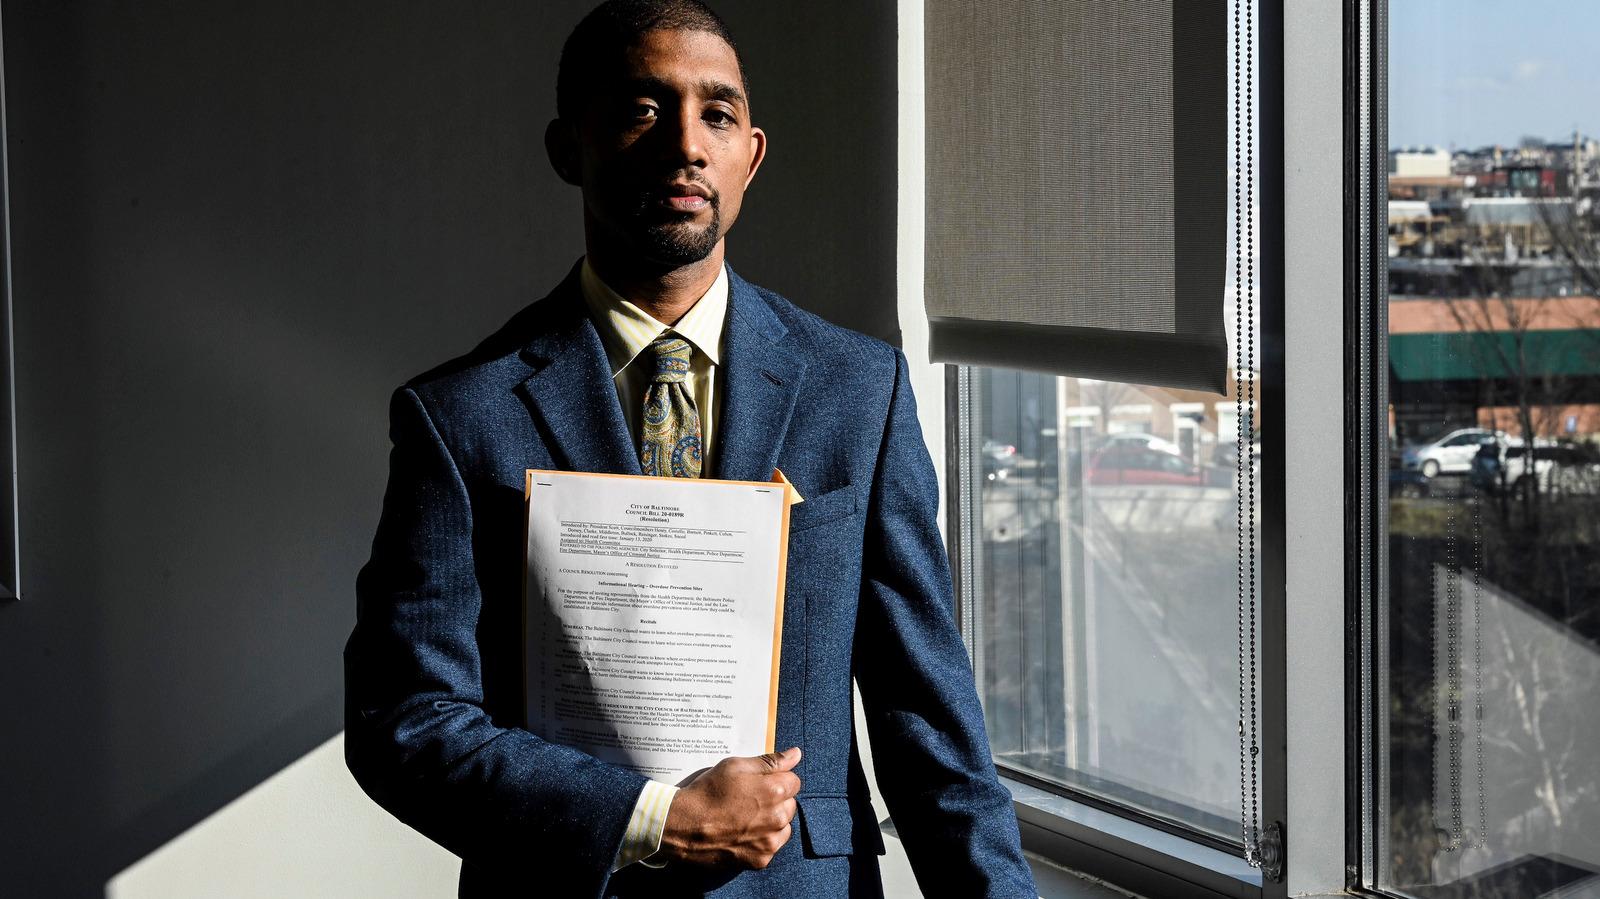 Brandon M. Scott photographed by J.M. Giordano.